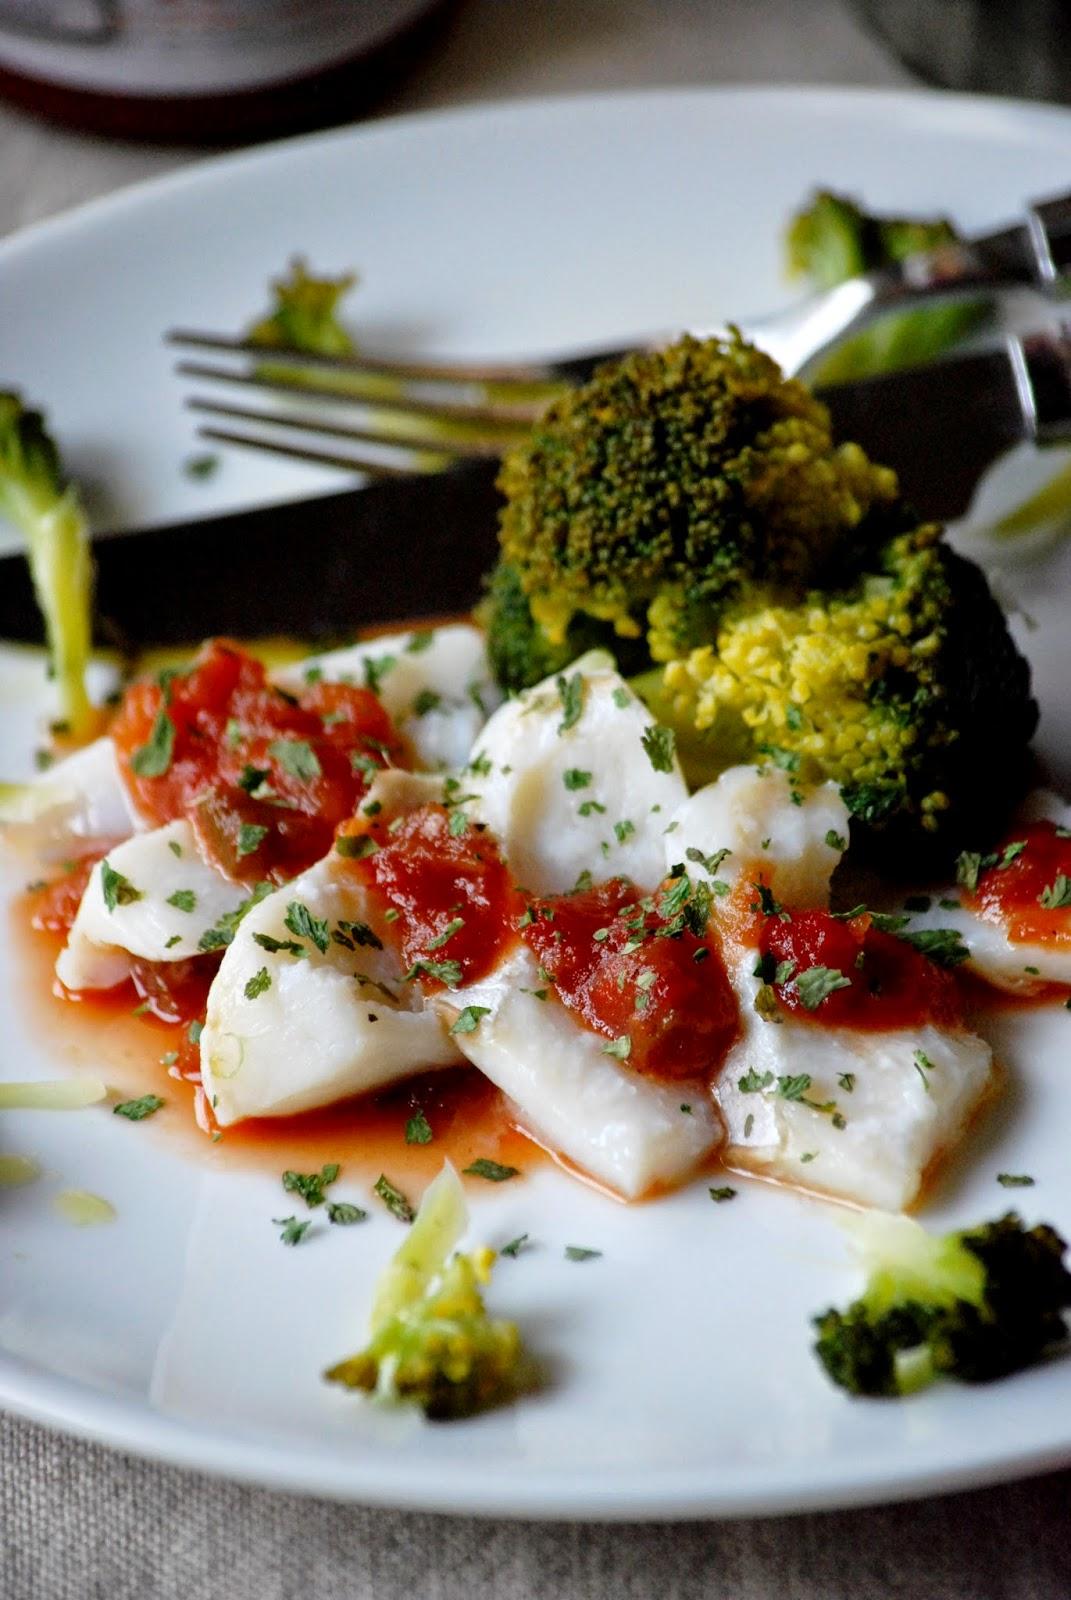 bacalao, chutney de pisto, brócoli